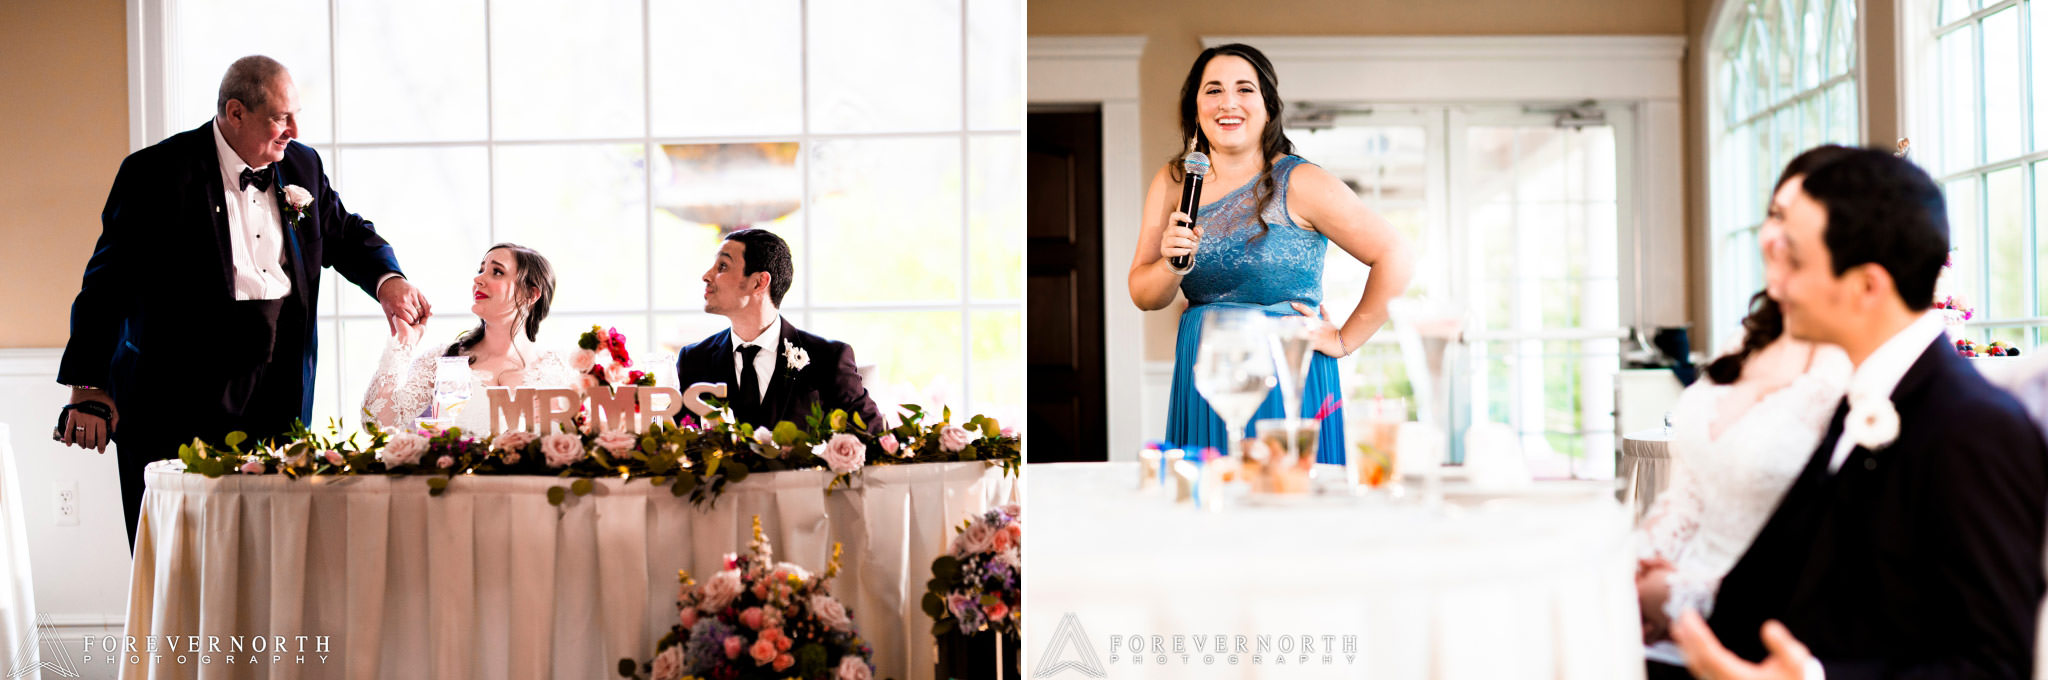 Rivera-Bradford-Estate-Wedding-Photographer-05.JPG